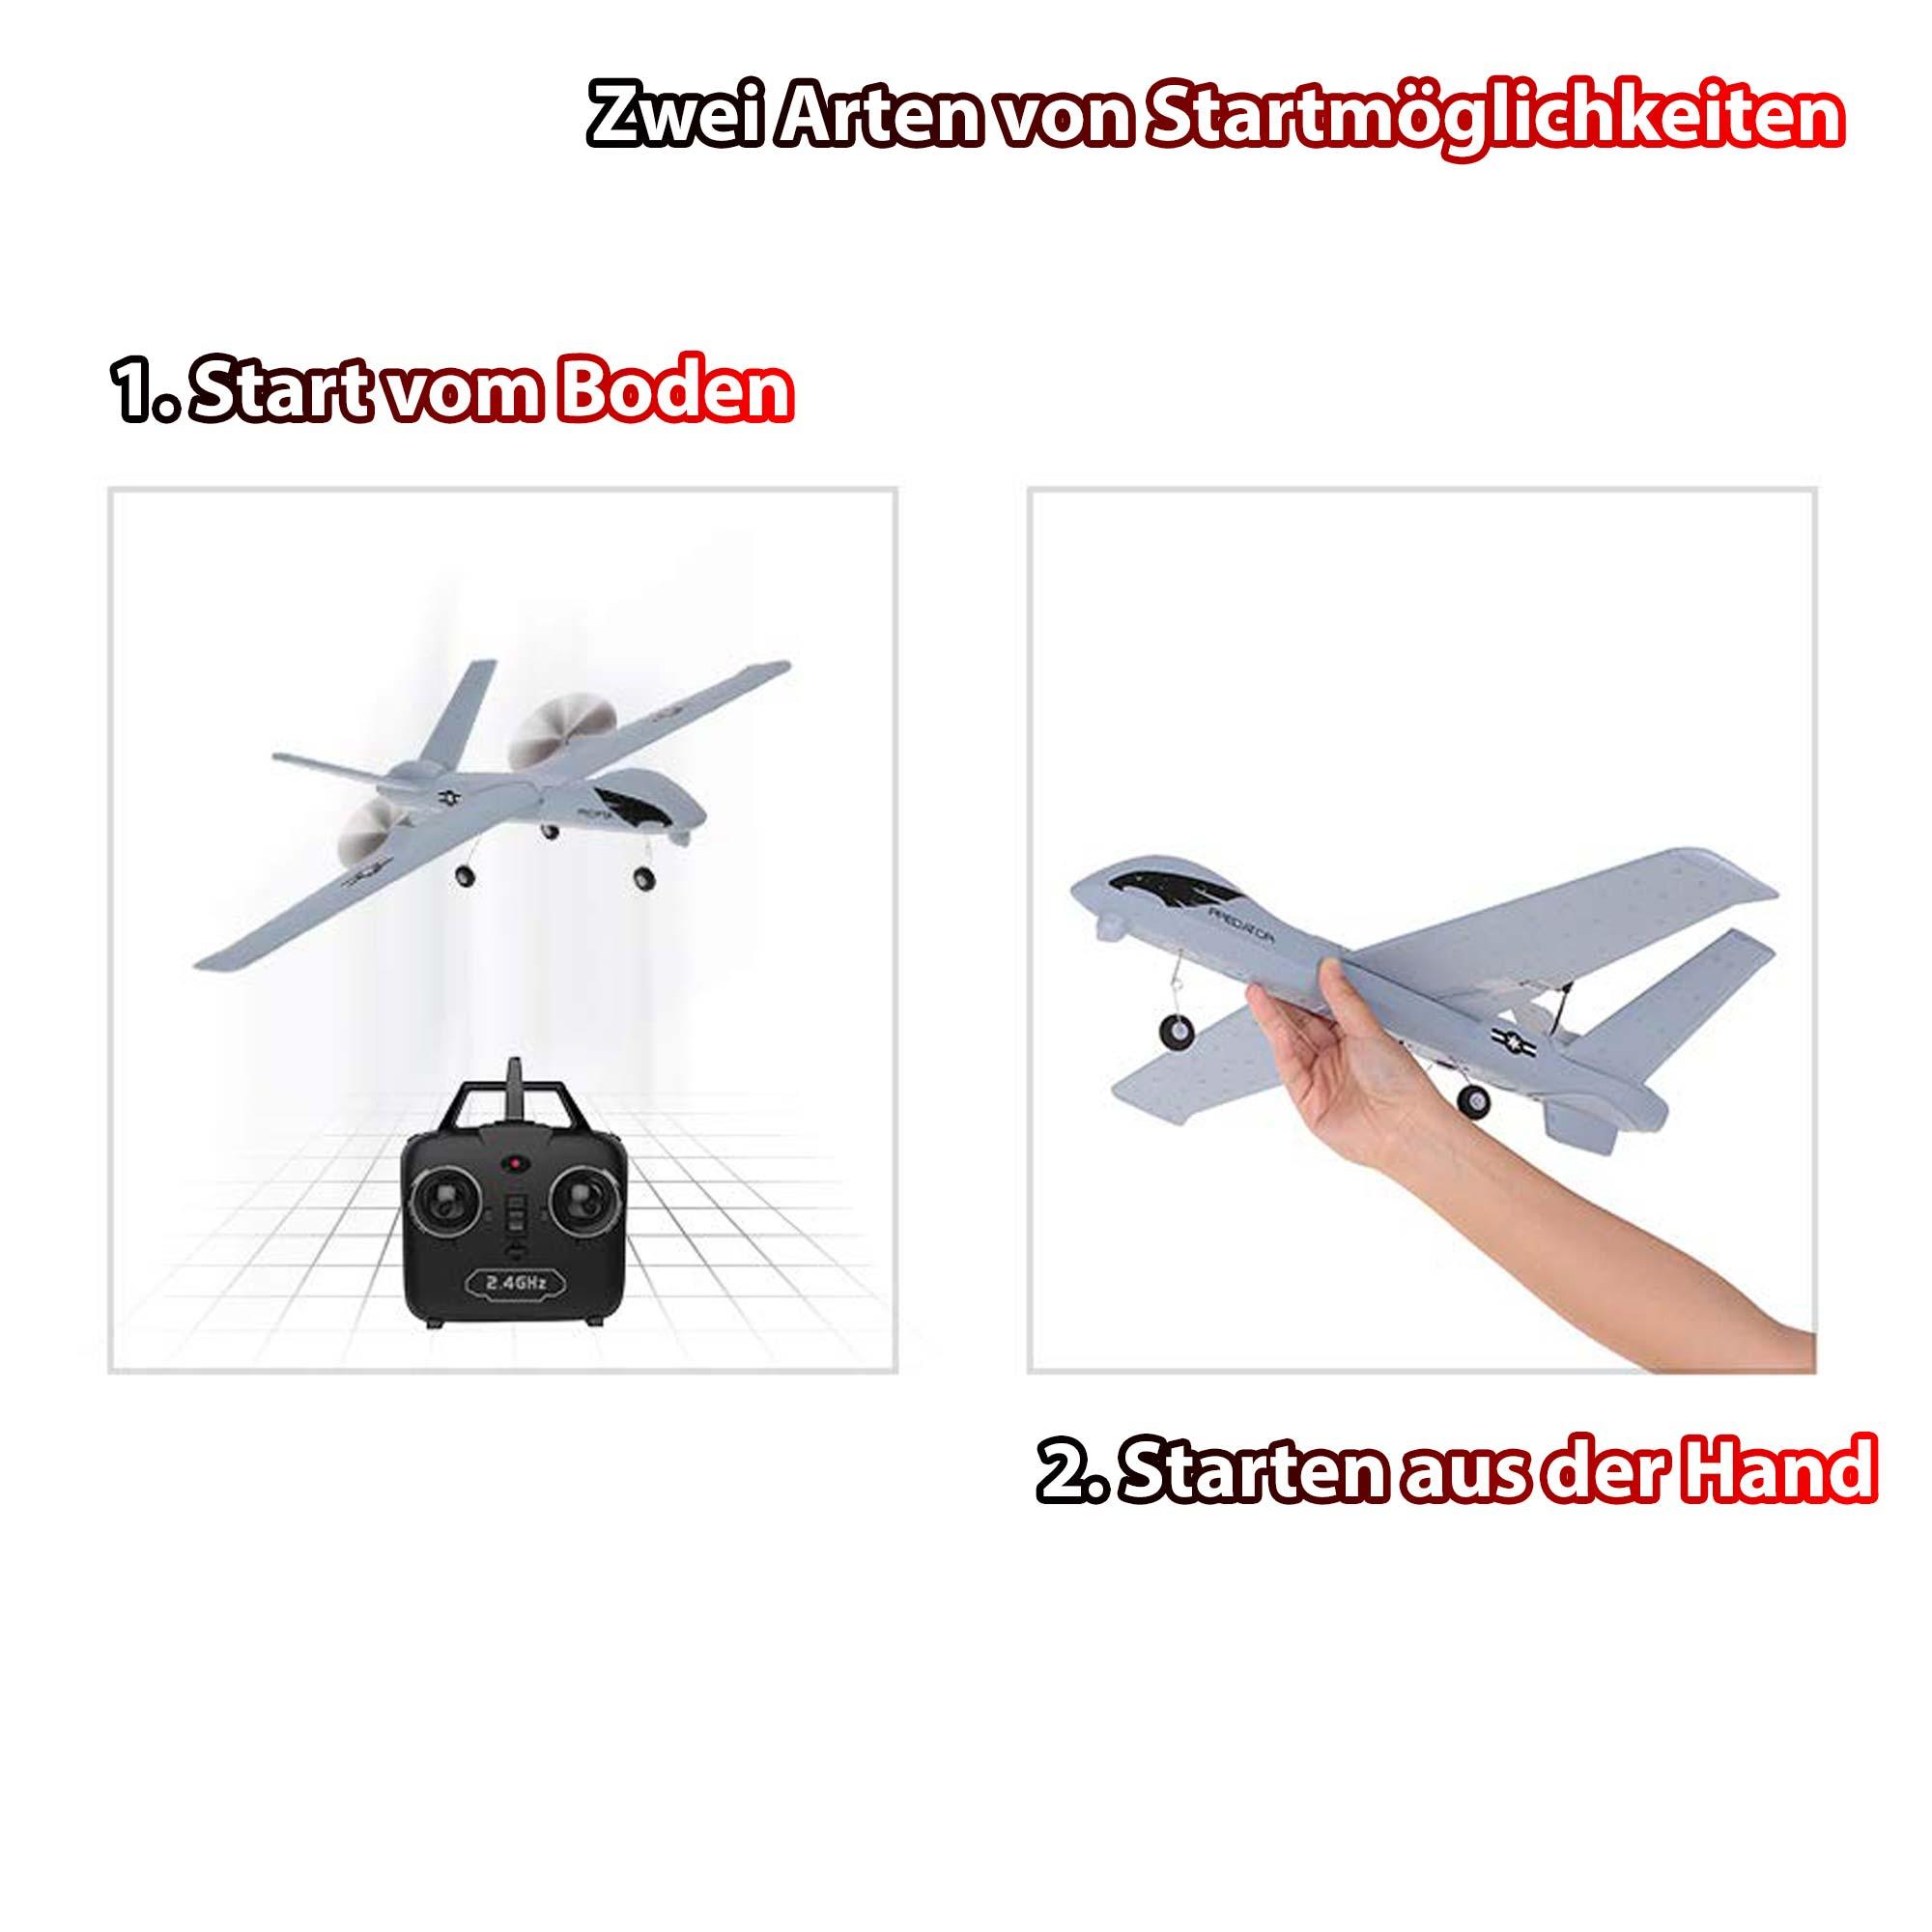 Flugzeug-Modell RC ferngesteuertes Segelflugzeug Aufklärungs-Drohne mit Akku